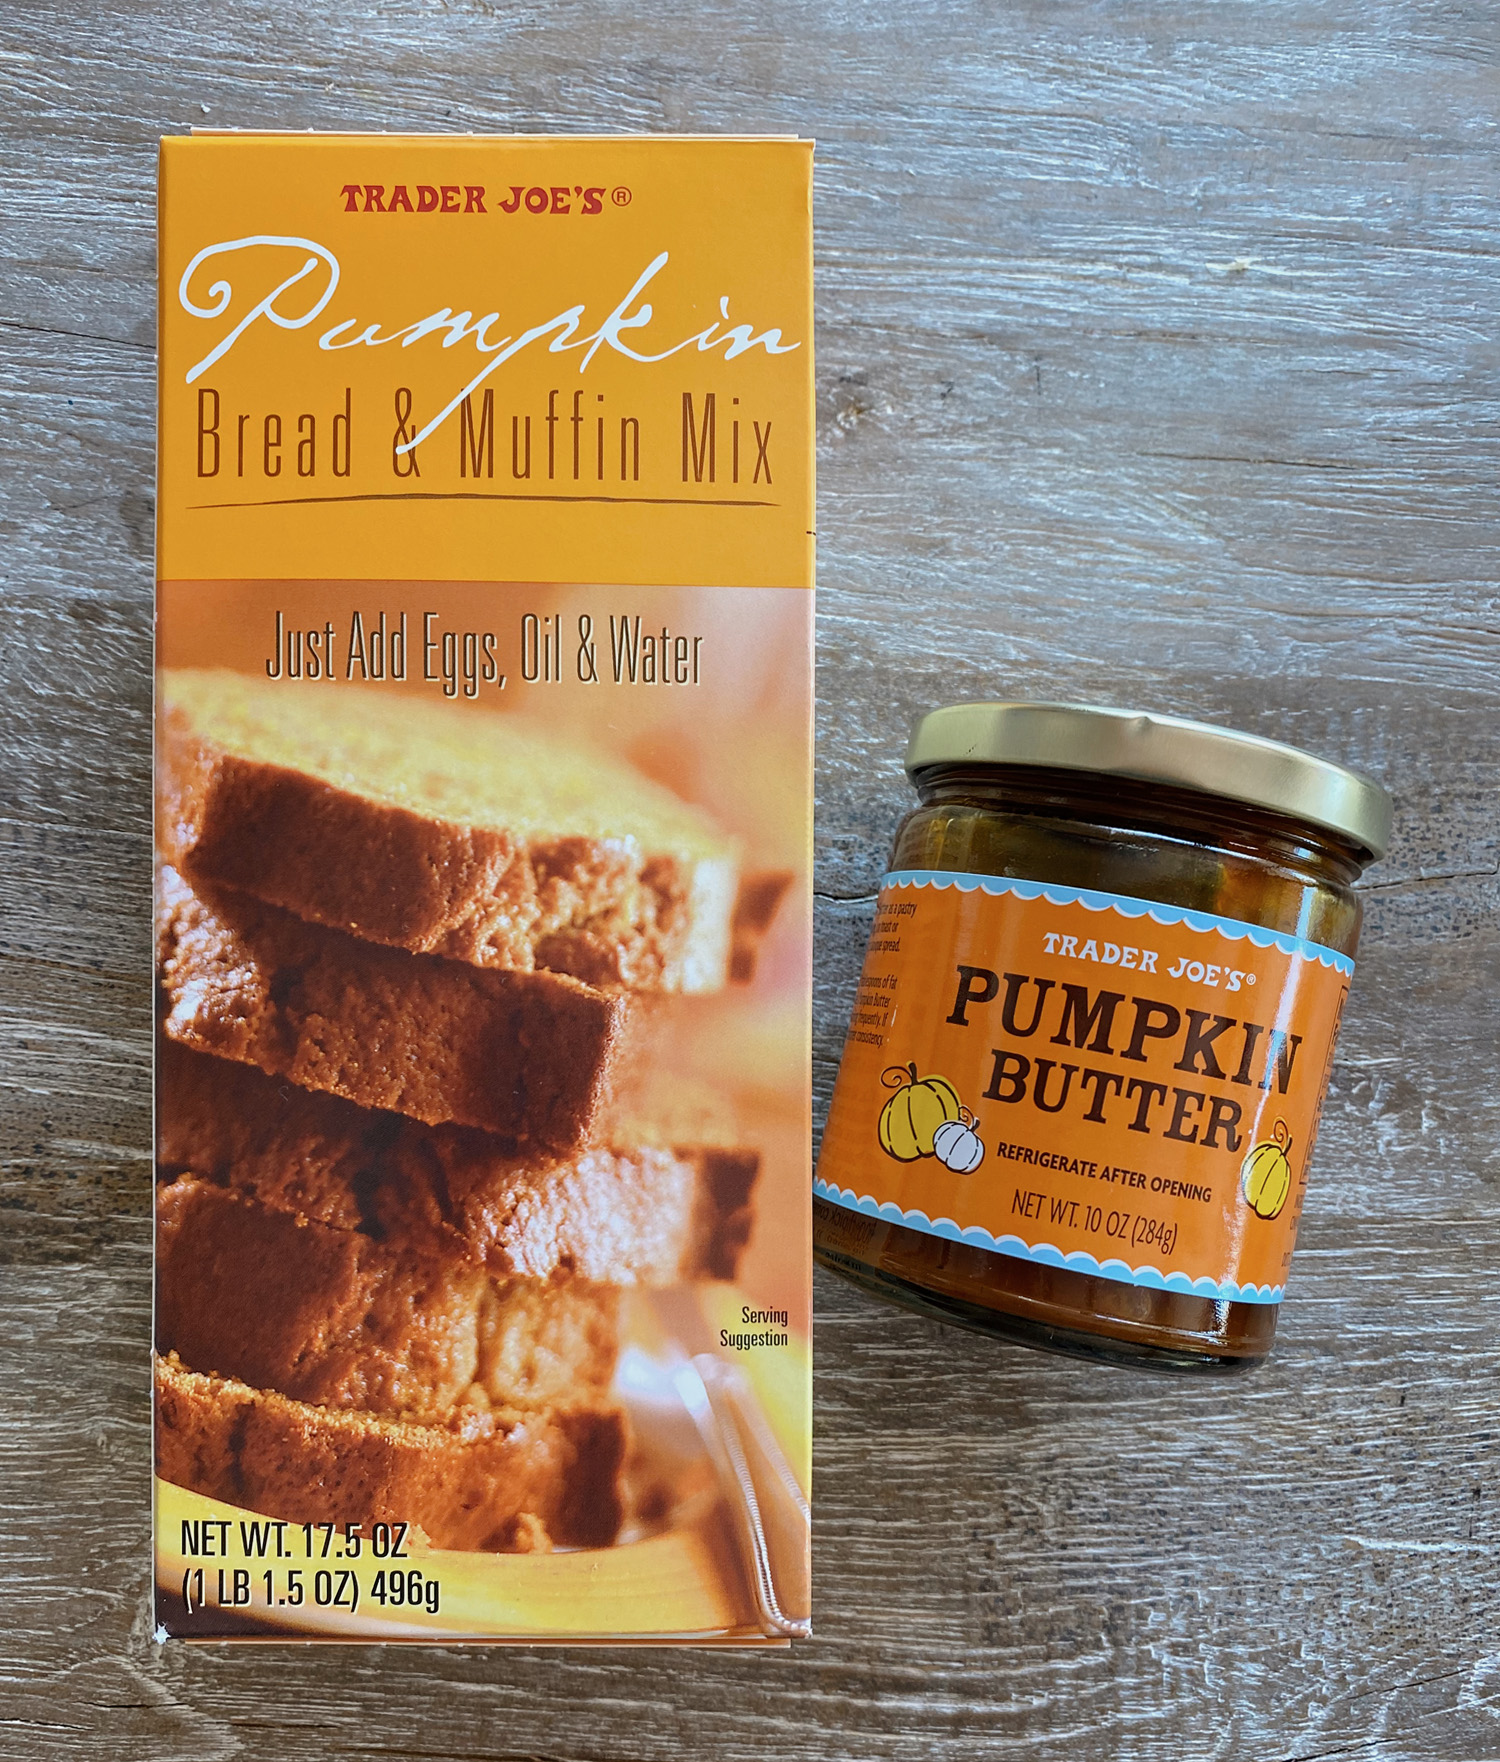 Trader Joe's Pumpkin Bread and Muffin Mix